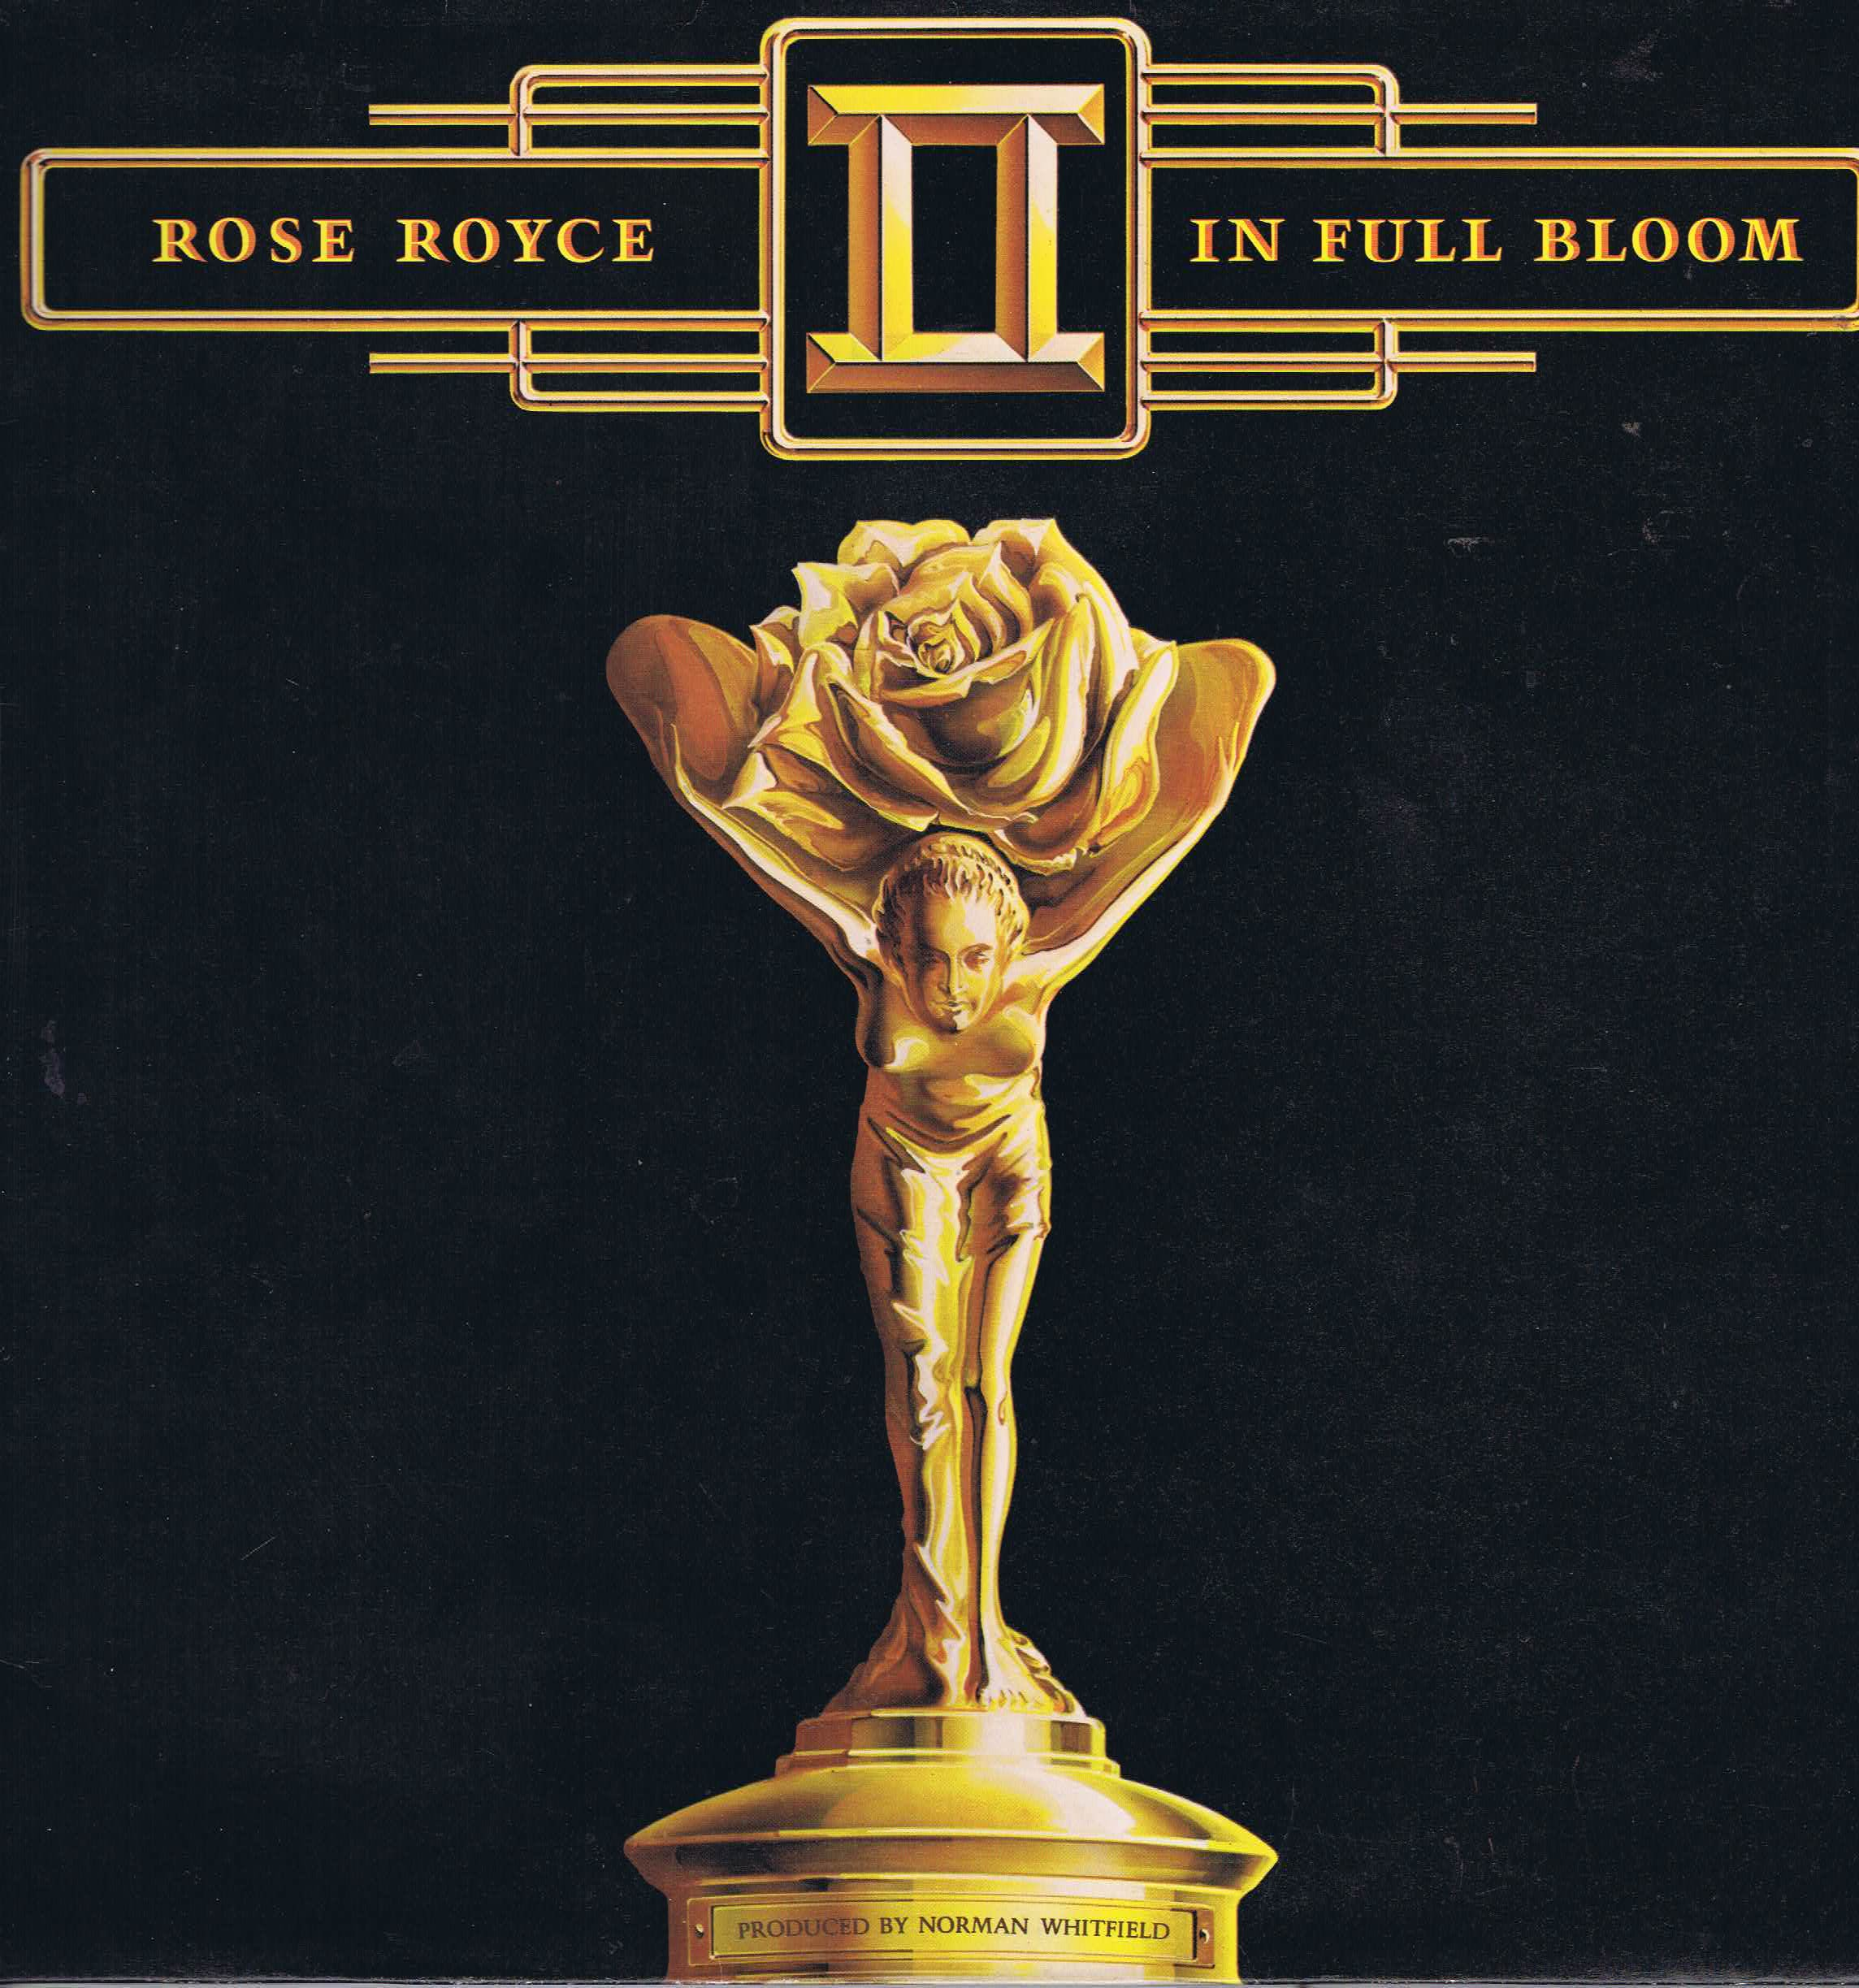 Rose Royce In Full Bloom K 56394 Lp Vinyl Record